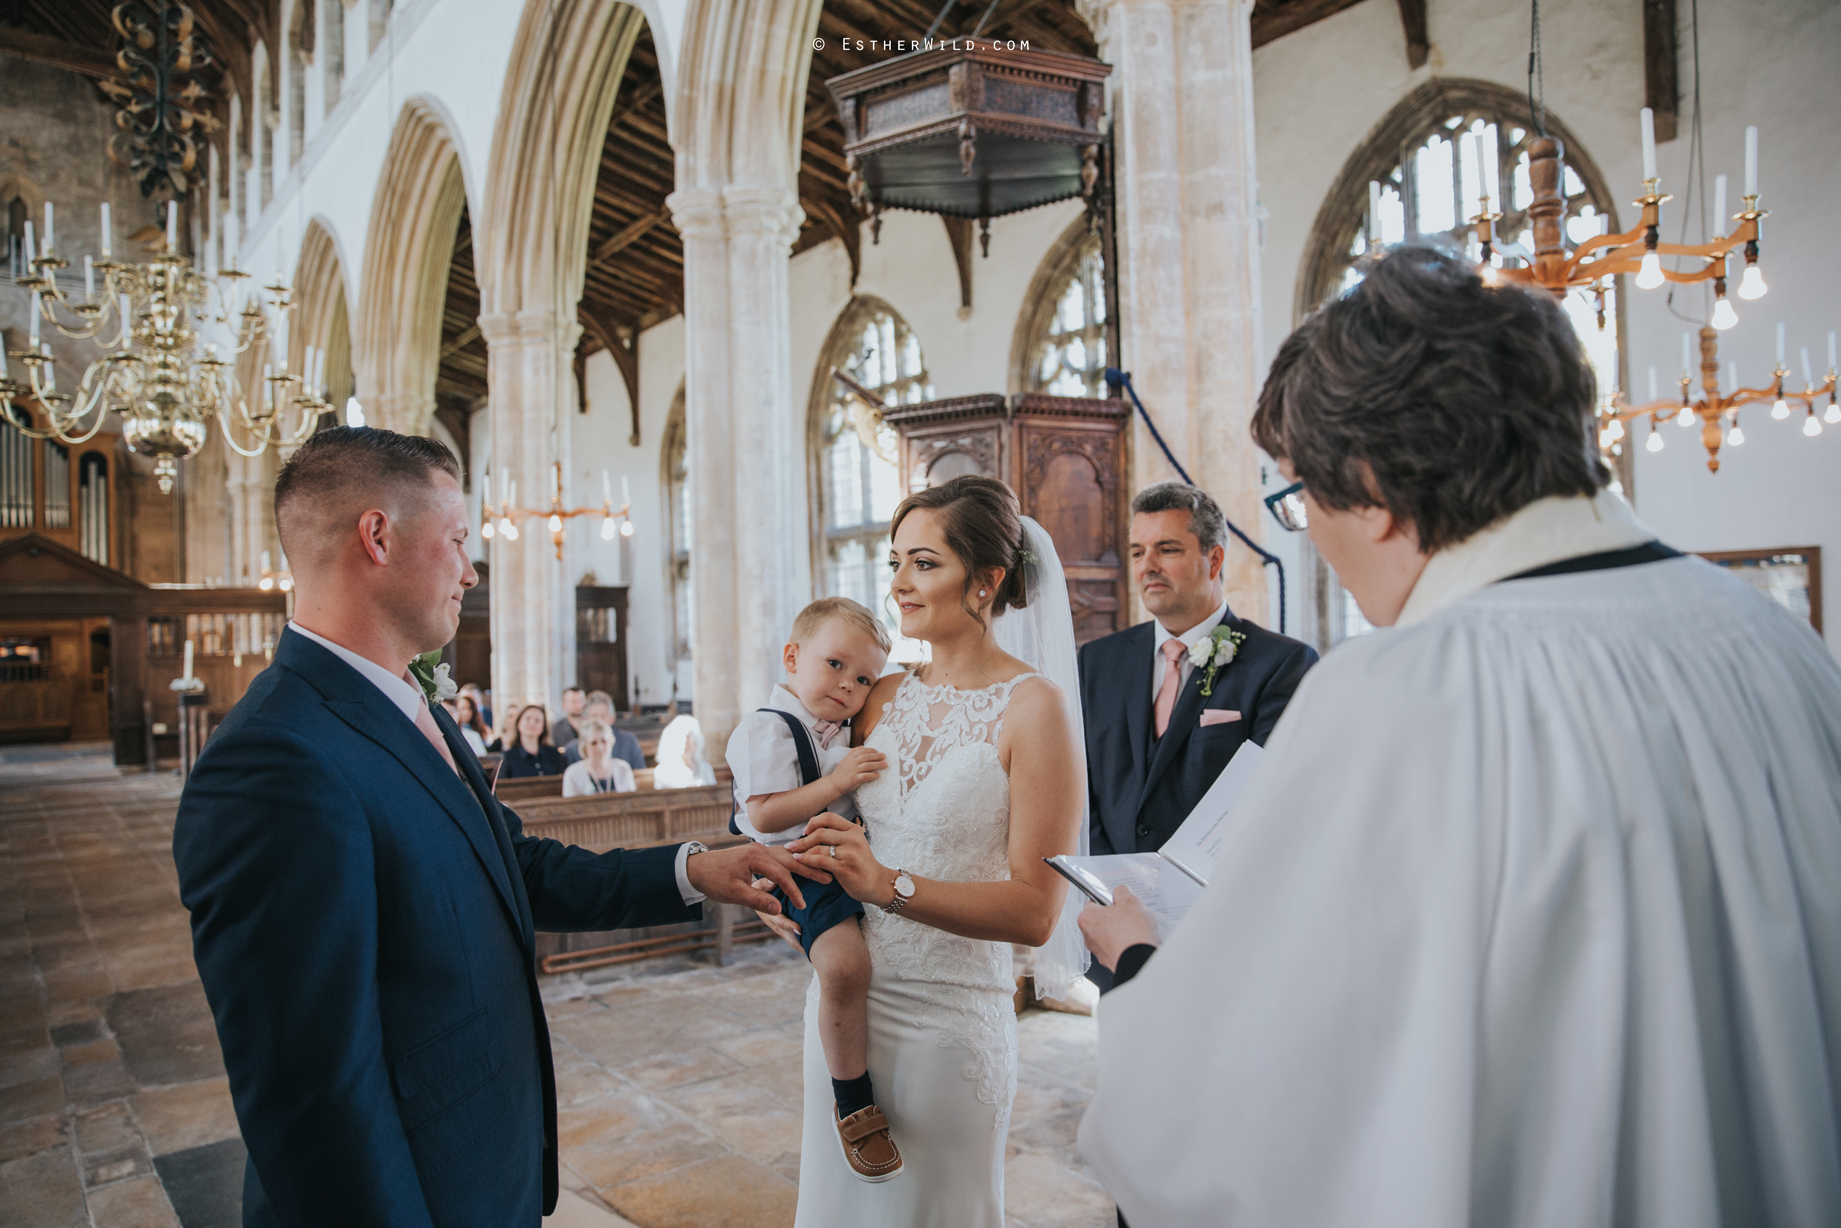 IMG_0549Walpole_St_Andrew_Church_Norfolk_Wedding_Copyright_Esther_Wild_Photographer_.jpg